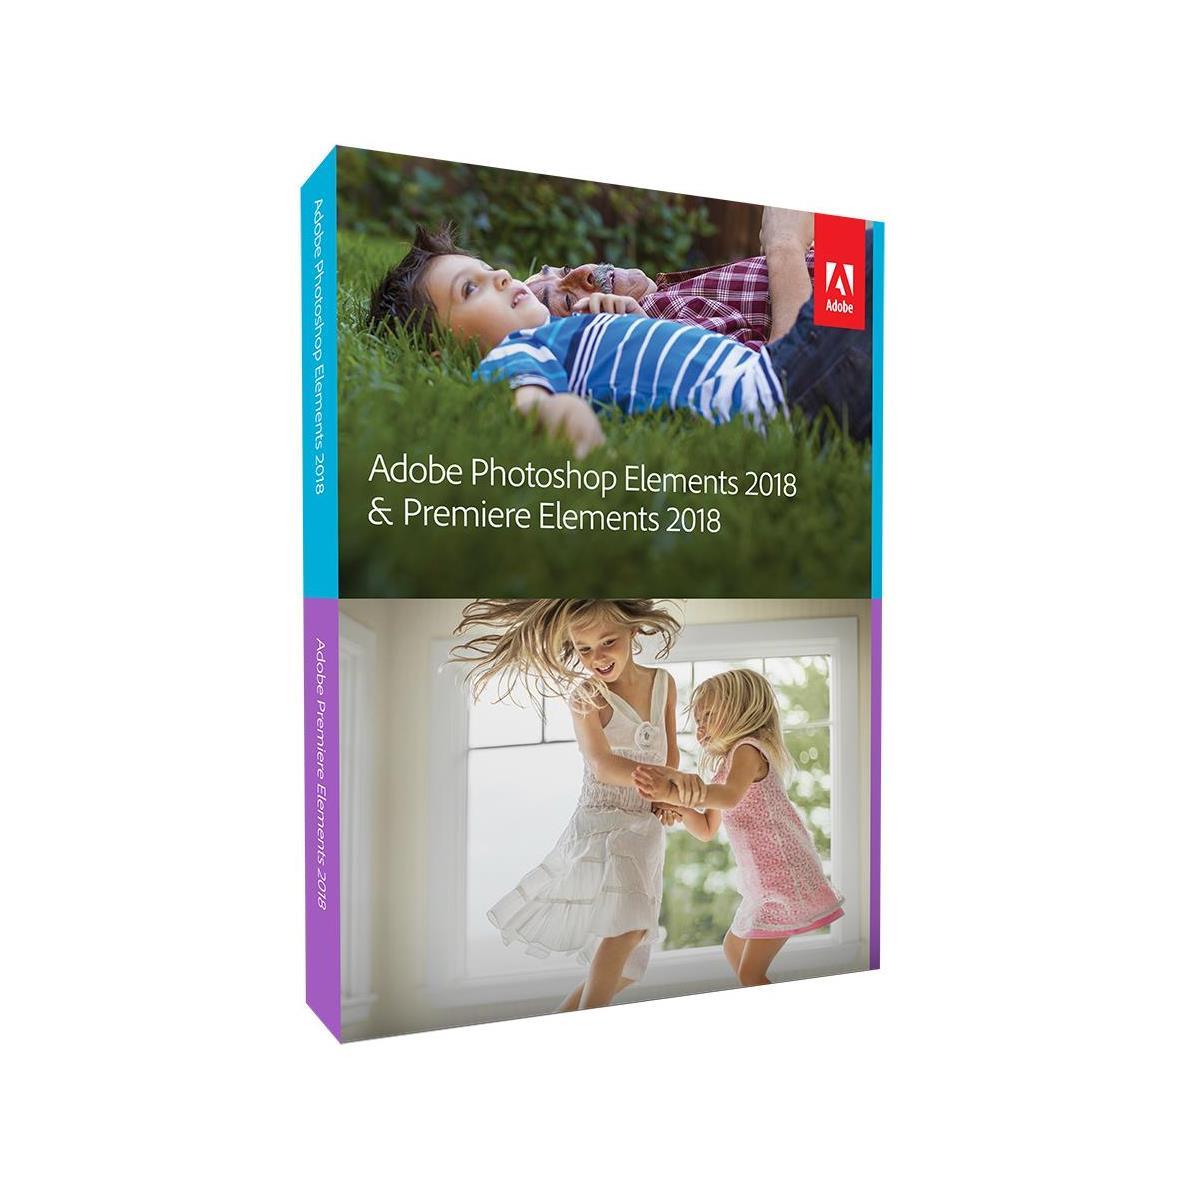 Adobe Released Adobe Photoshop Elements